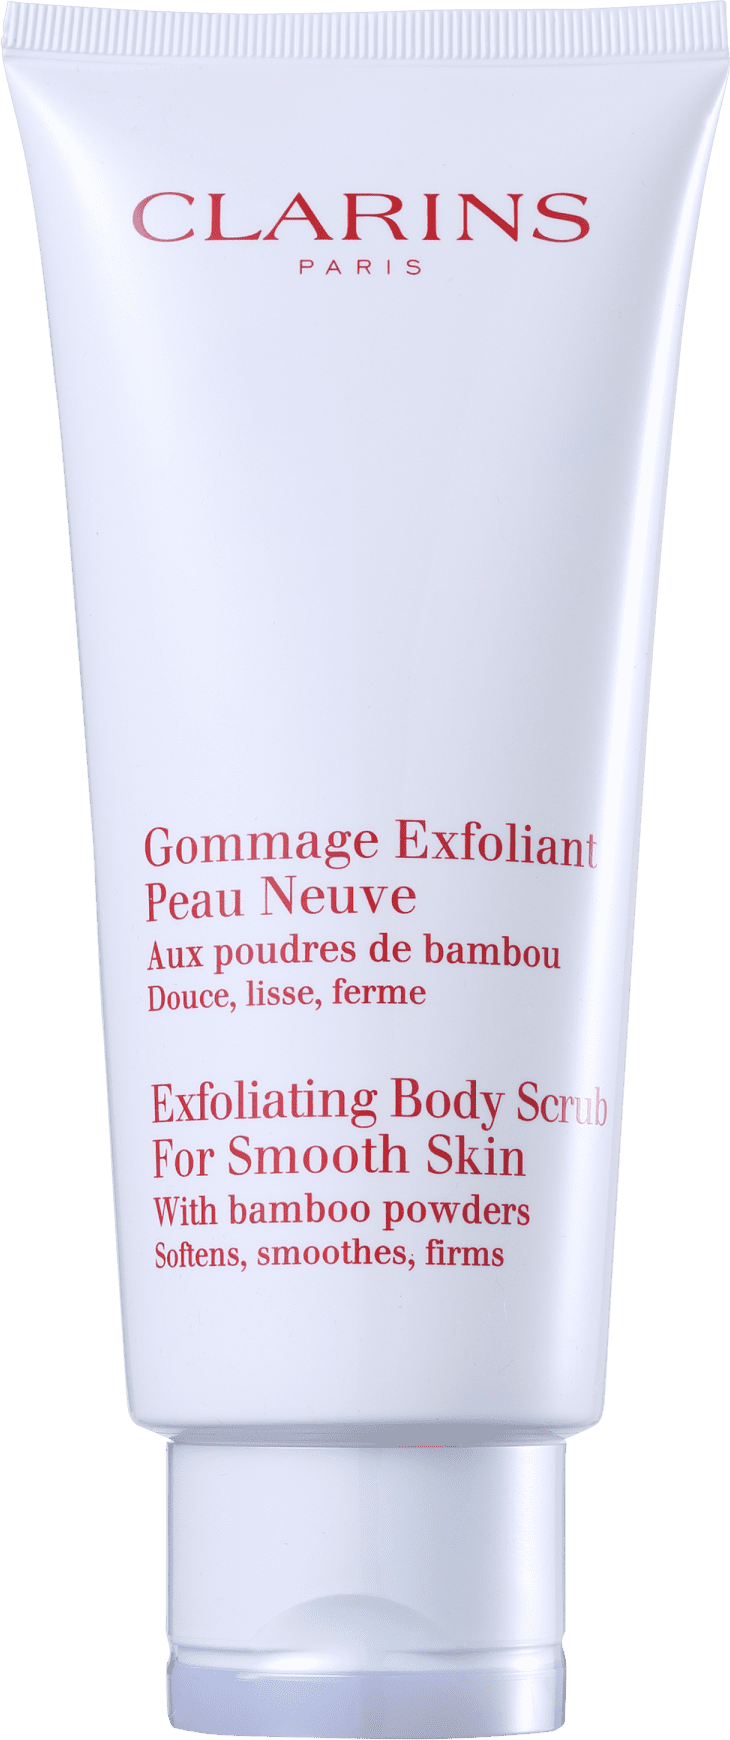 Esfoliante Clarins Body Scrub For Smooth Skin Beleza Na Web Marina 200ml Exfoliating Corporal